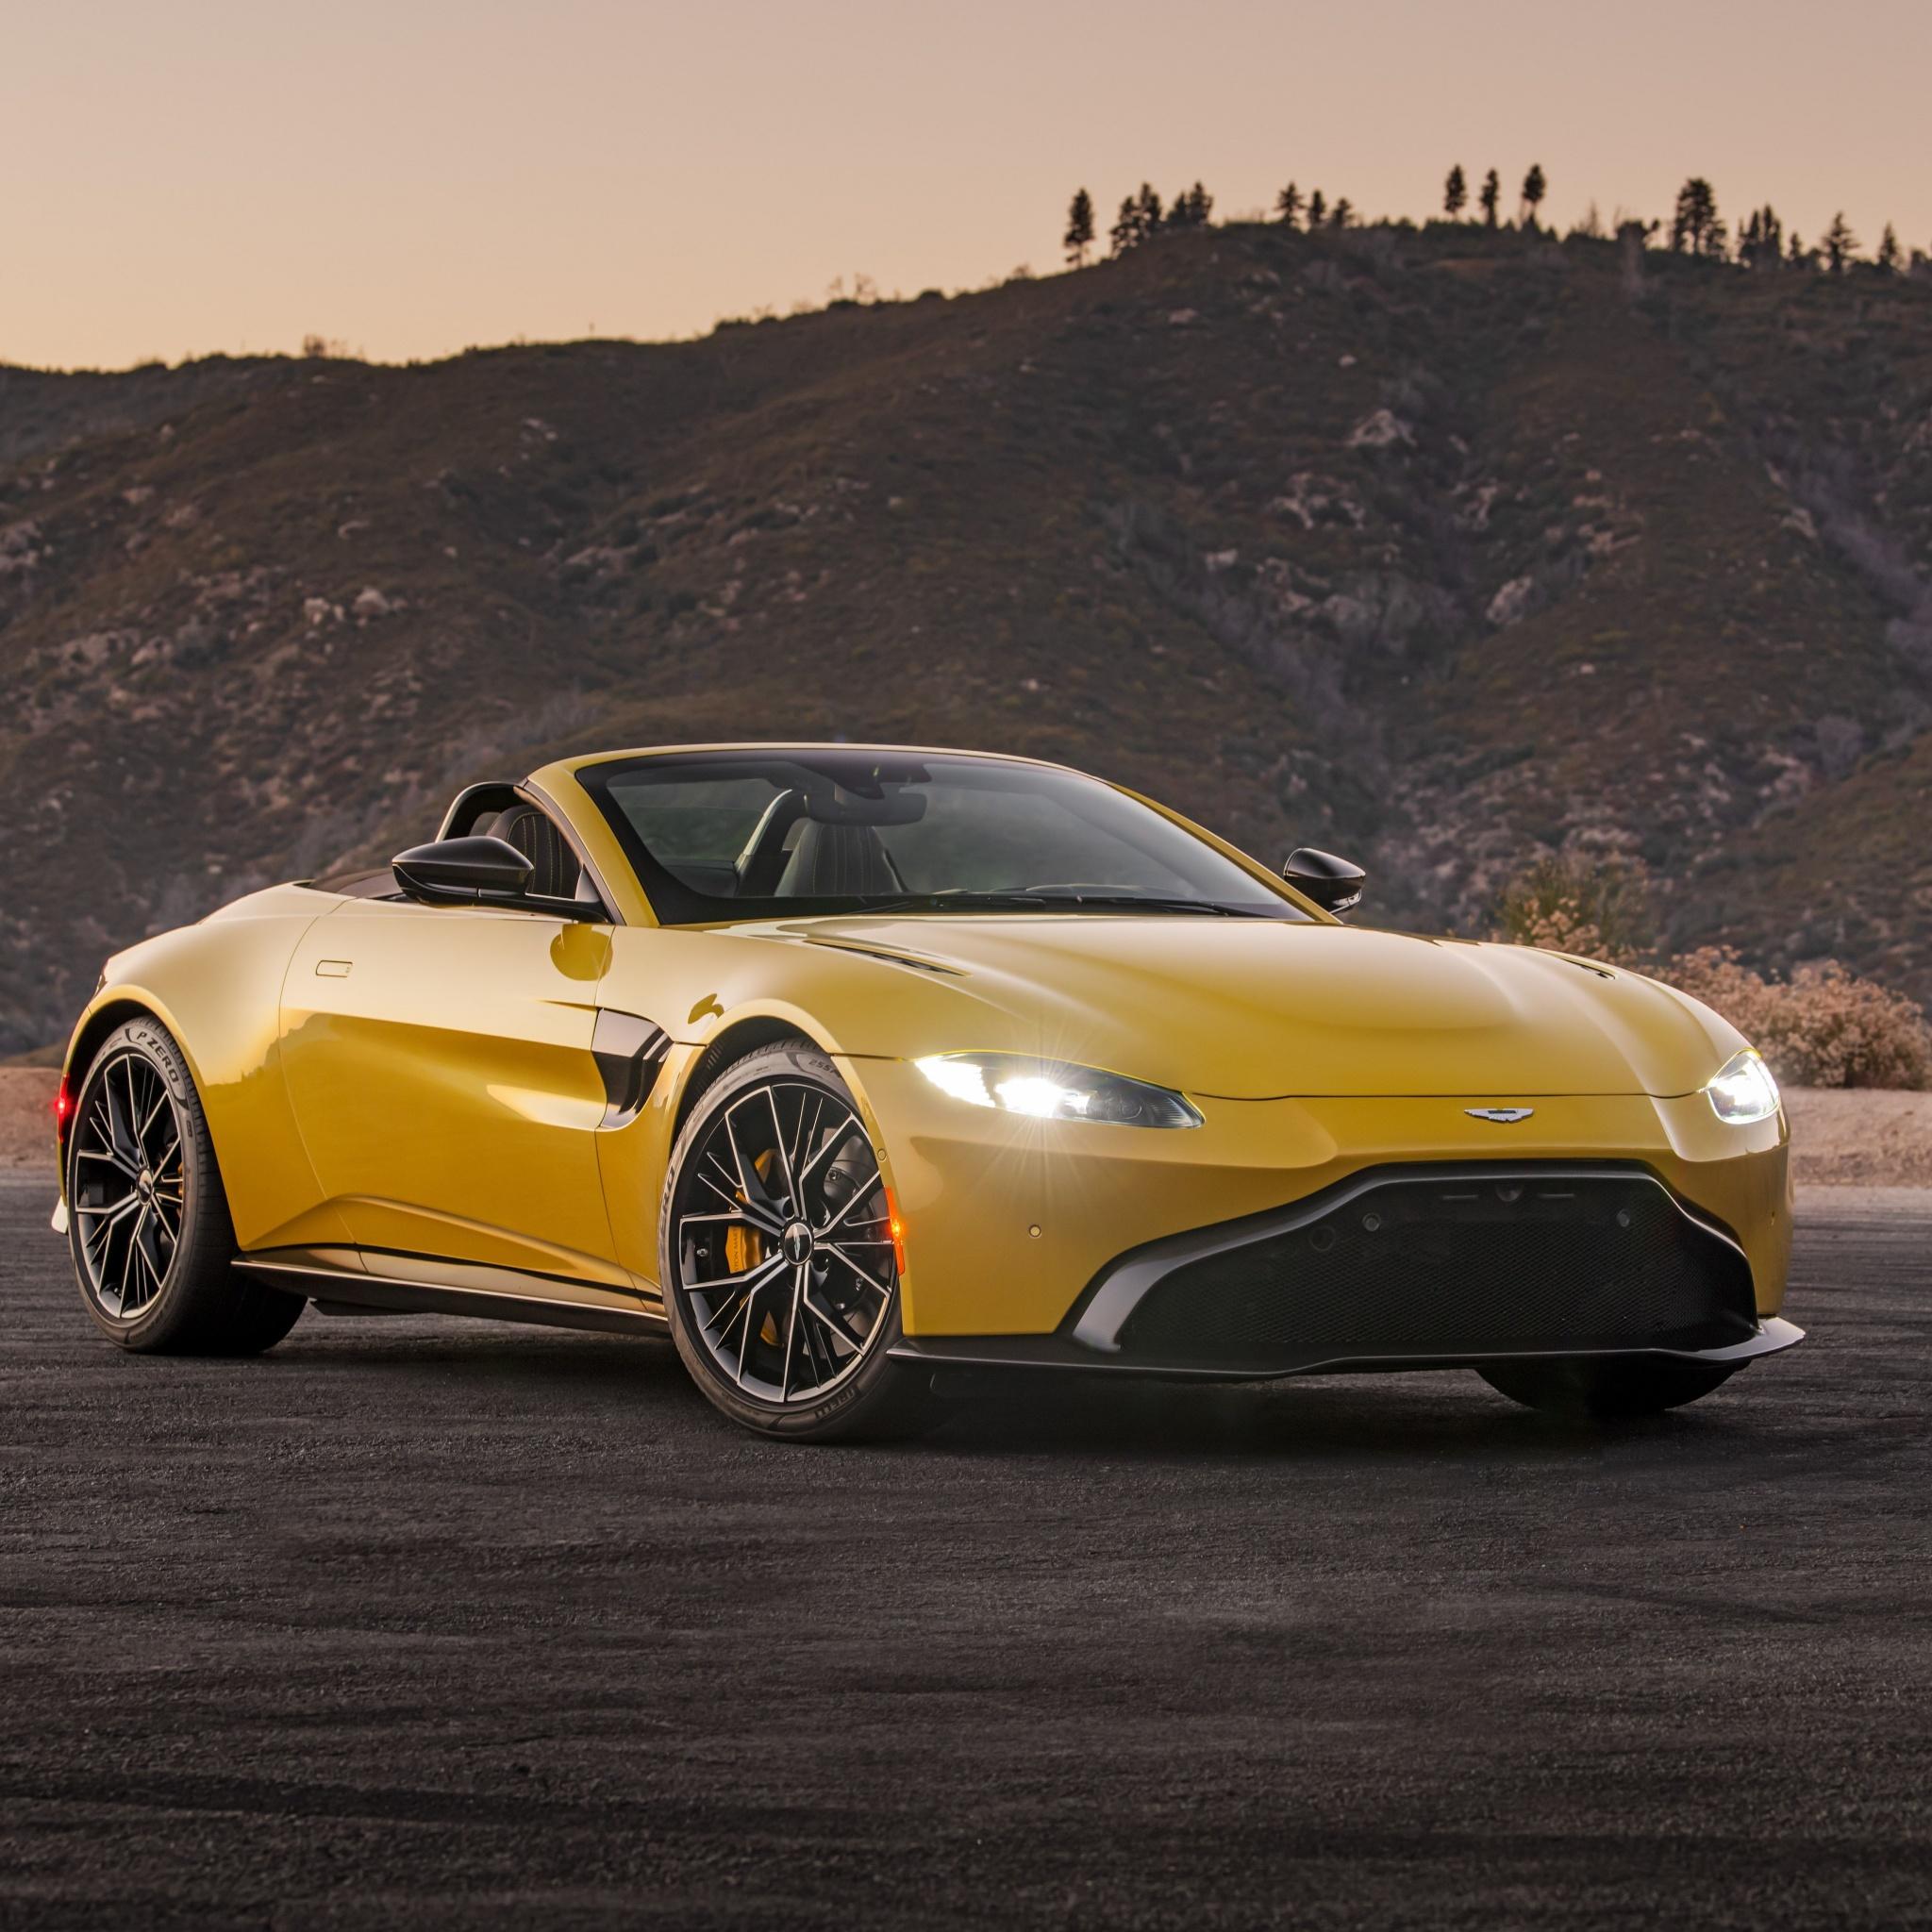 Aston Martin Vantage Roadster 4K Wallpaper, Sports Cars